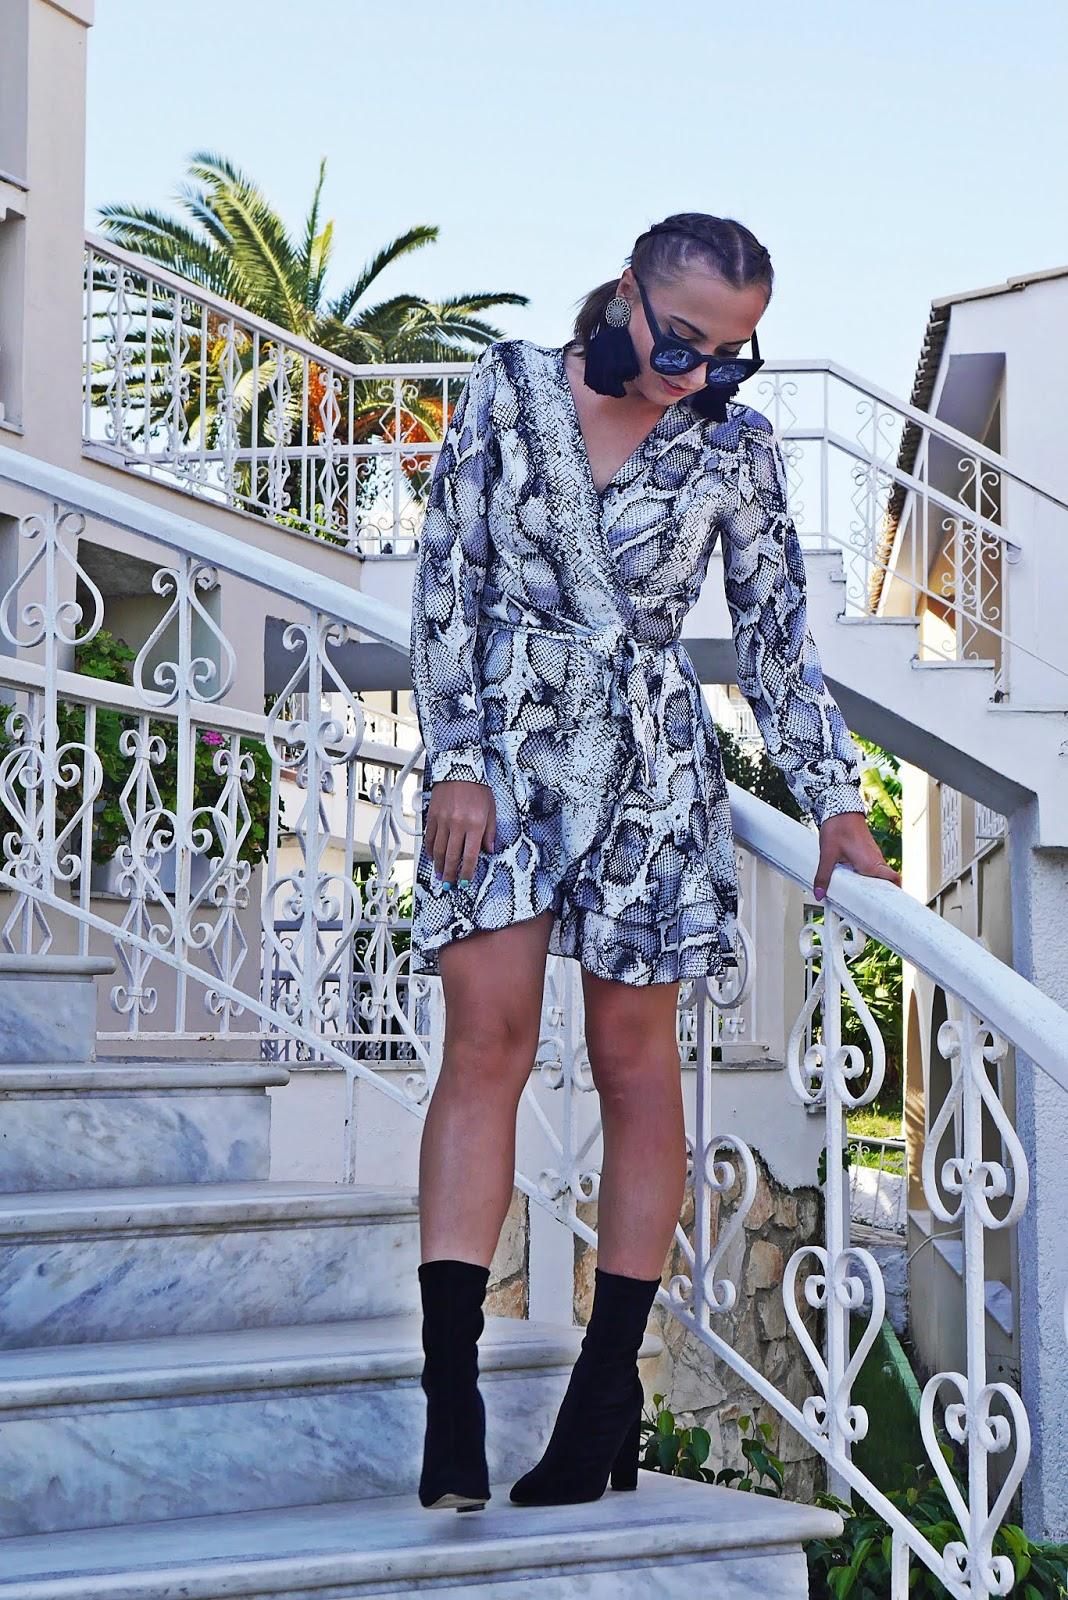 4_gray_printed_leo_snake_dress_socks_boots_black_karyn_blog_modowy_171018